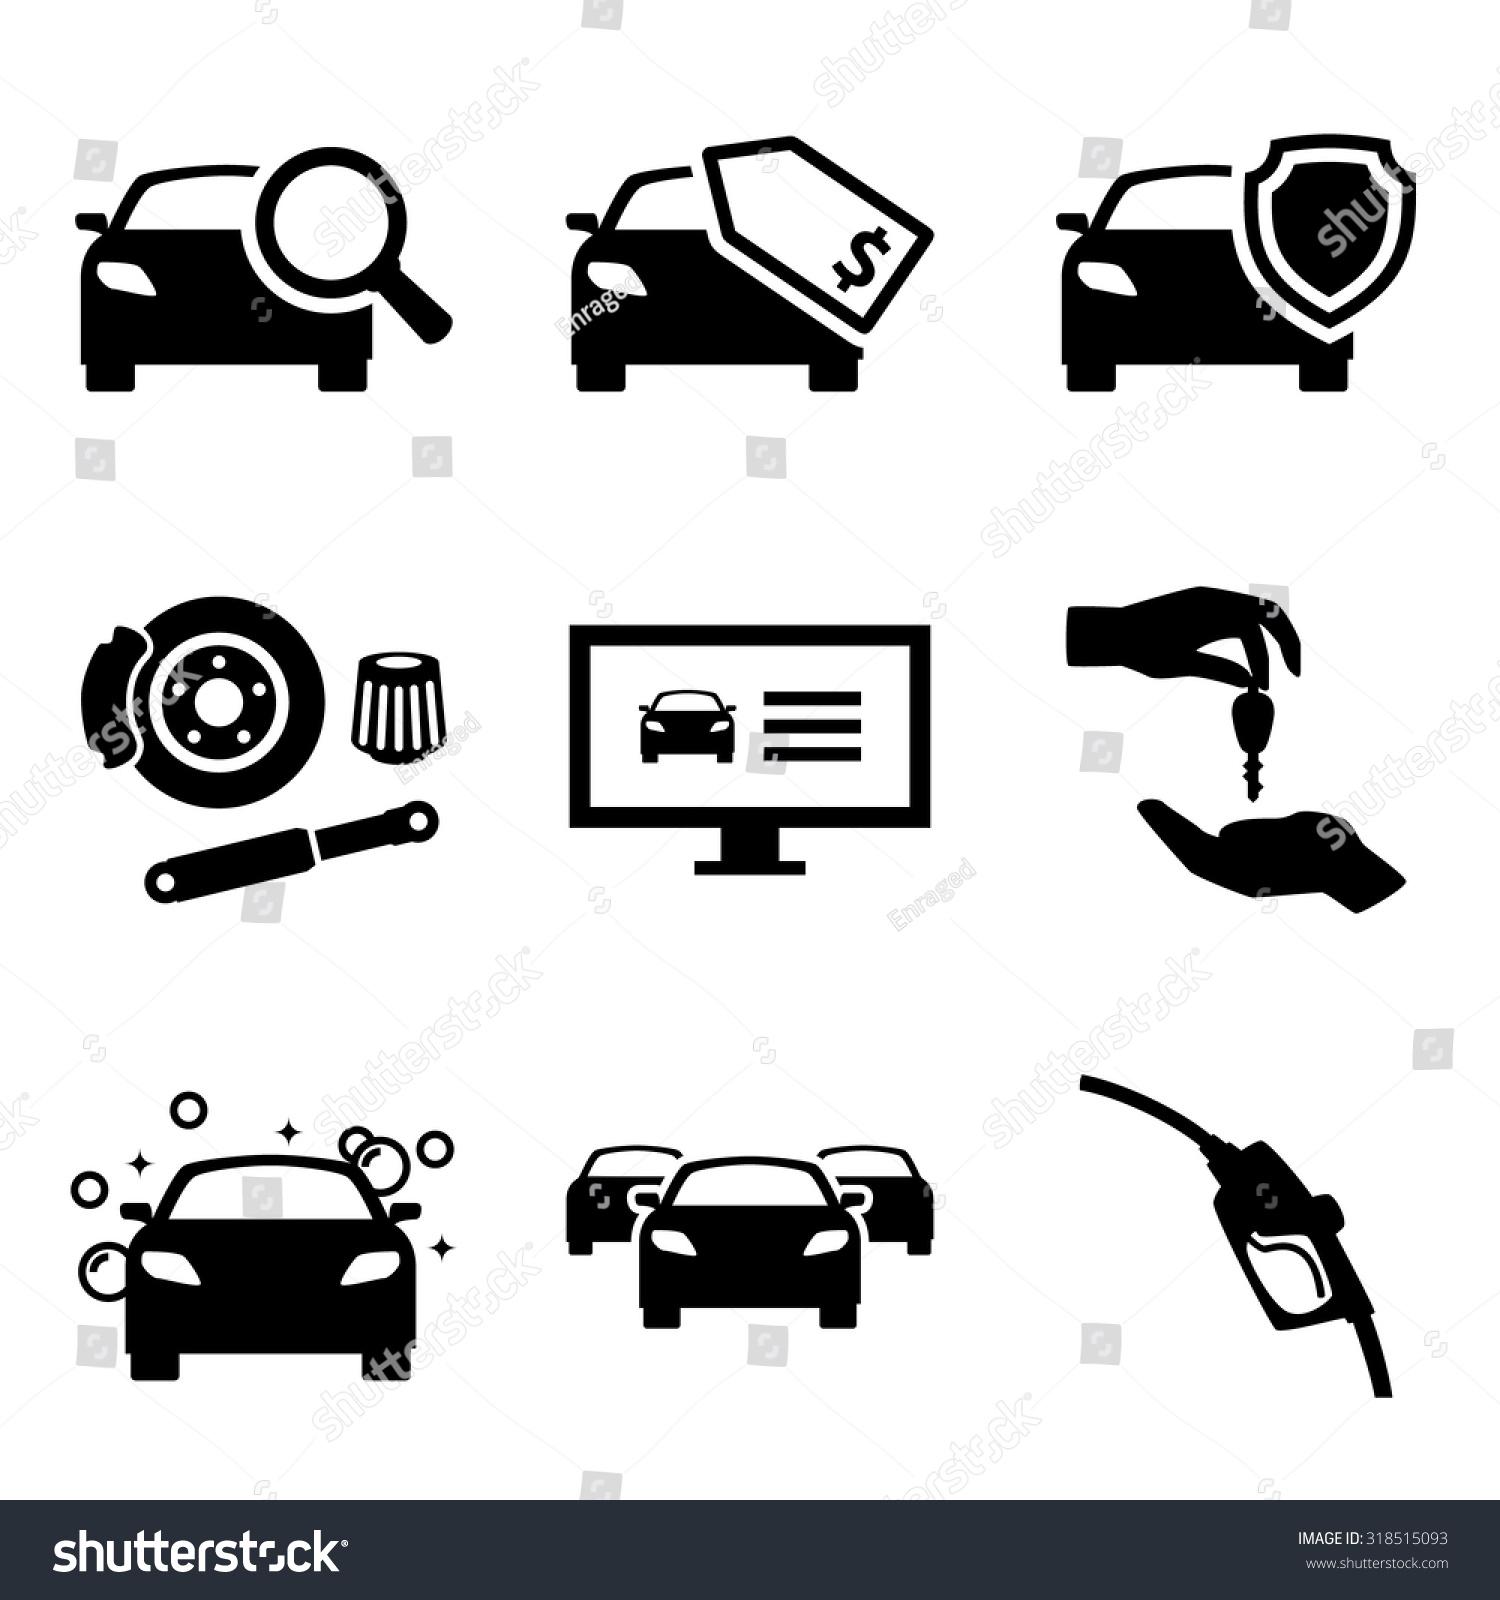 clipart car dealership - photo #28